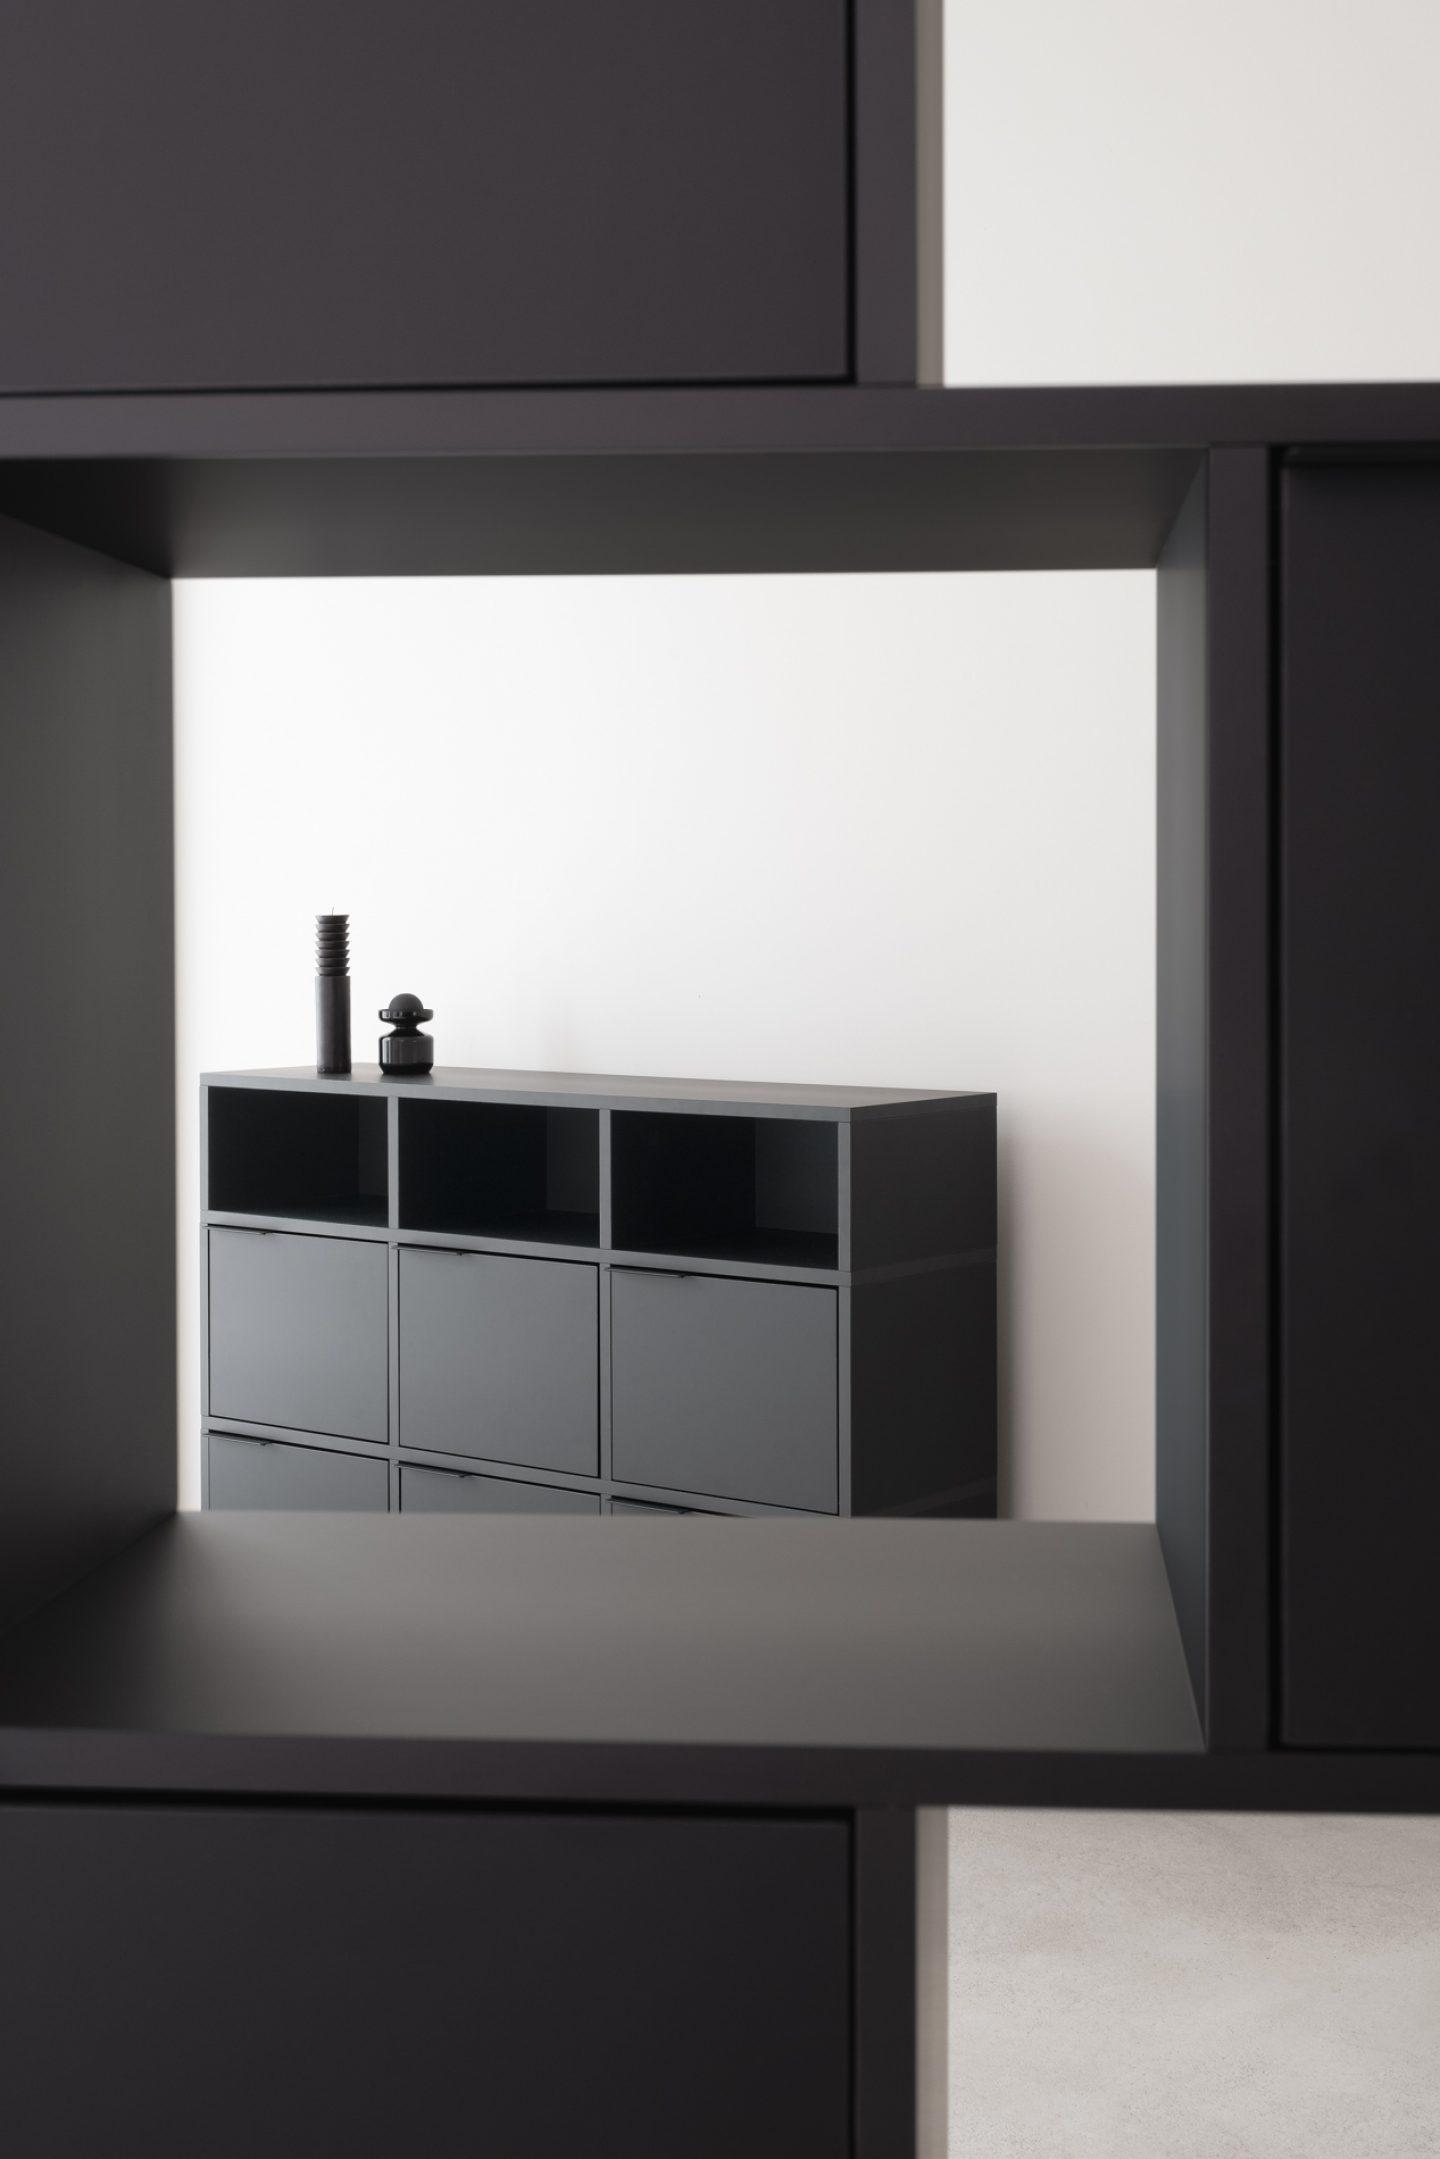 IGNANT-Tylko-shelf-design-Clemens-Poloczek--6